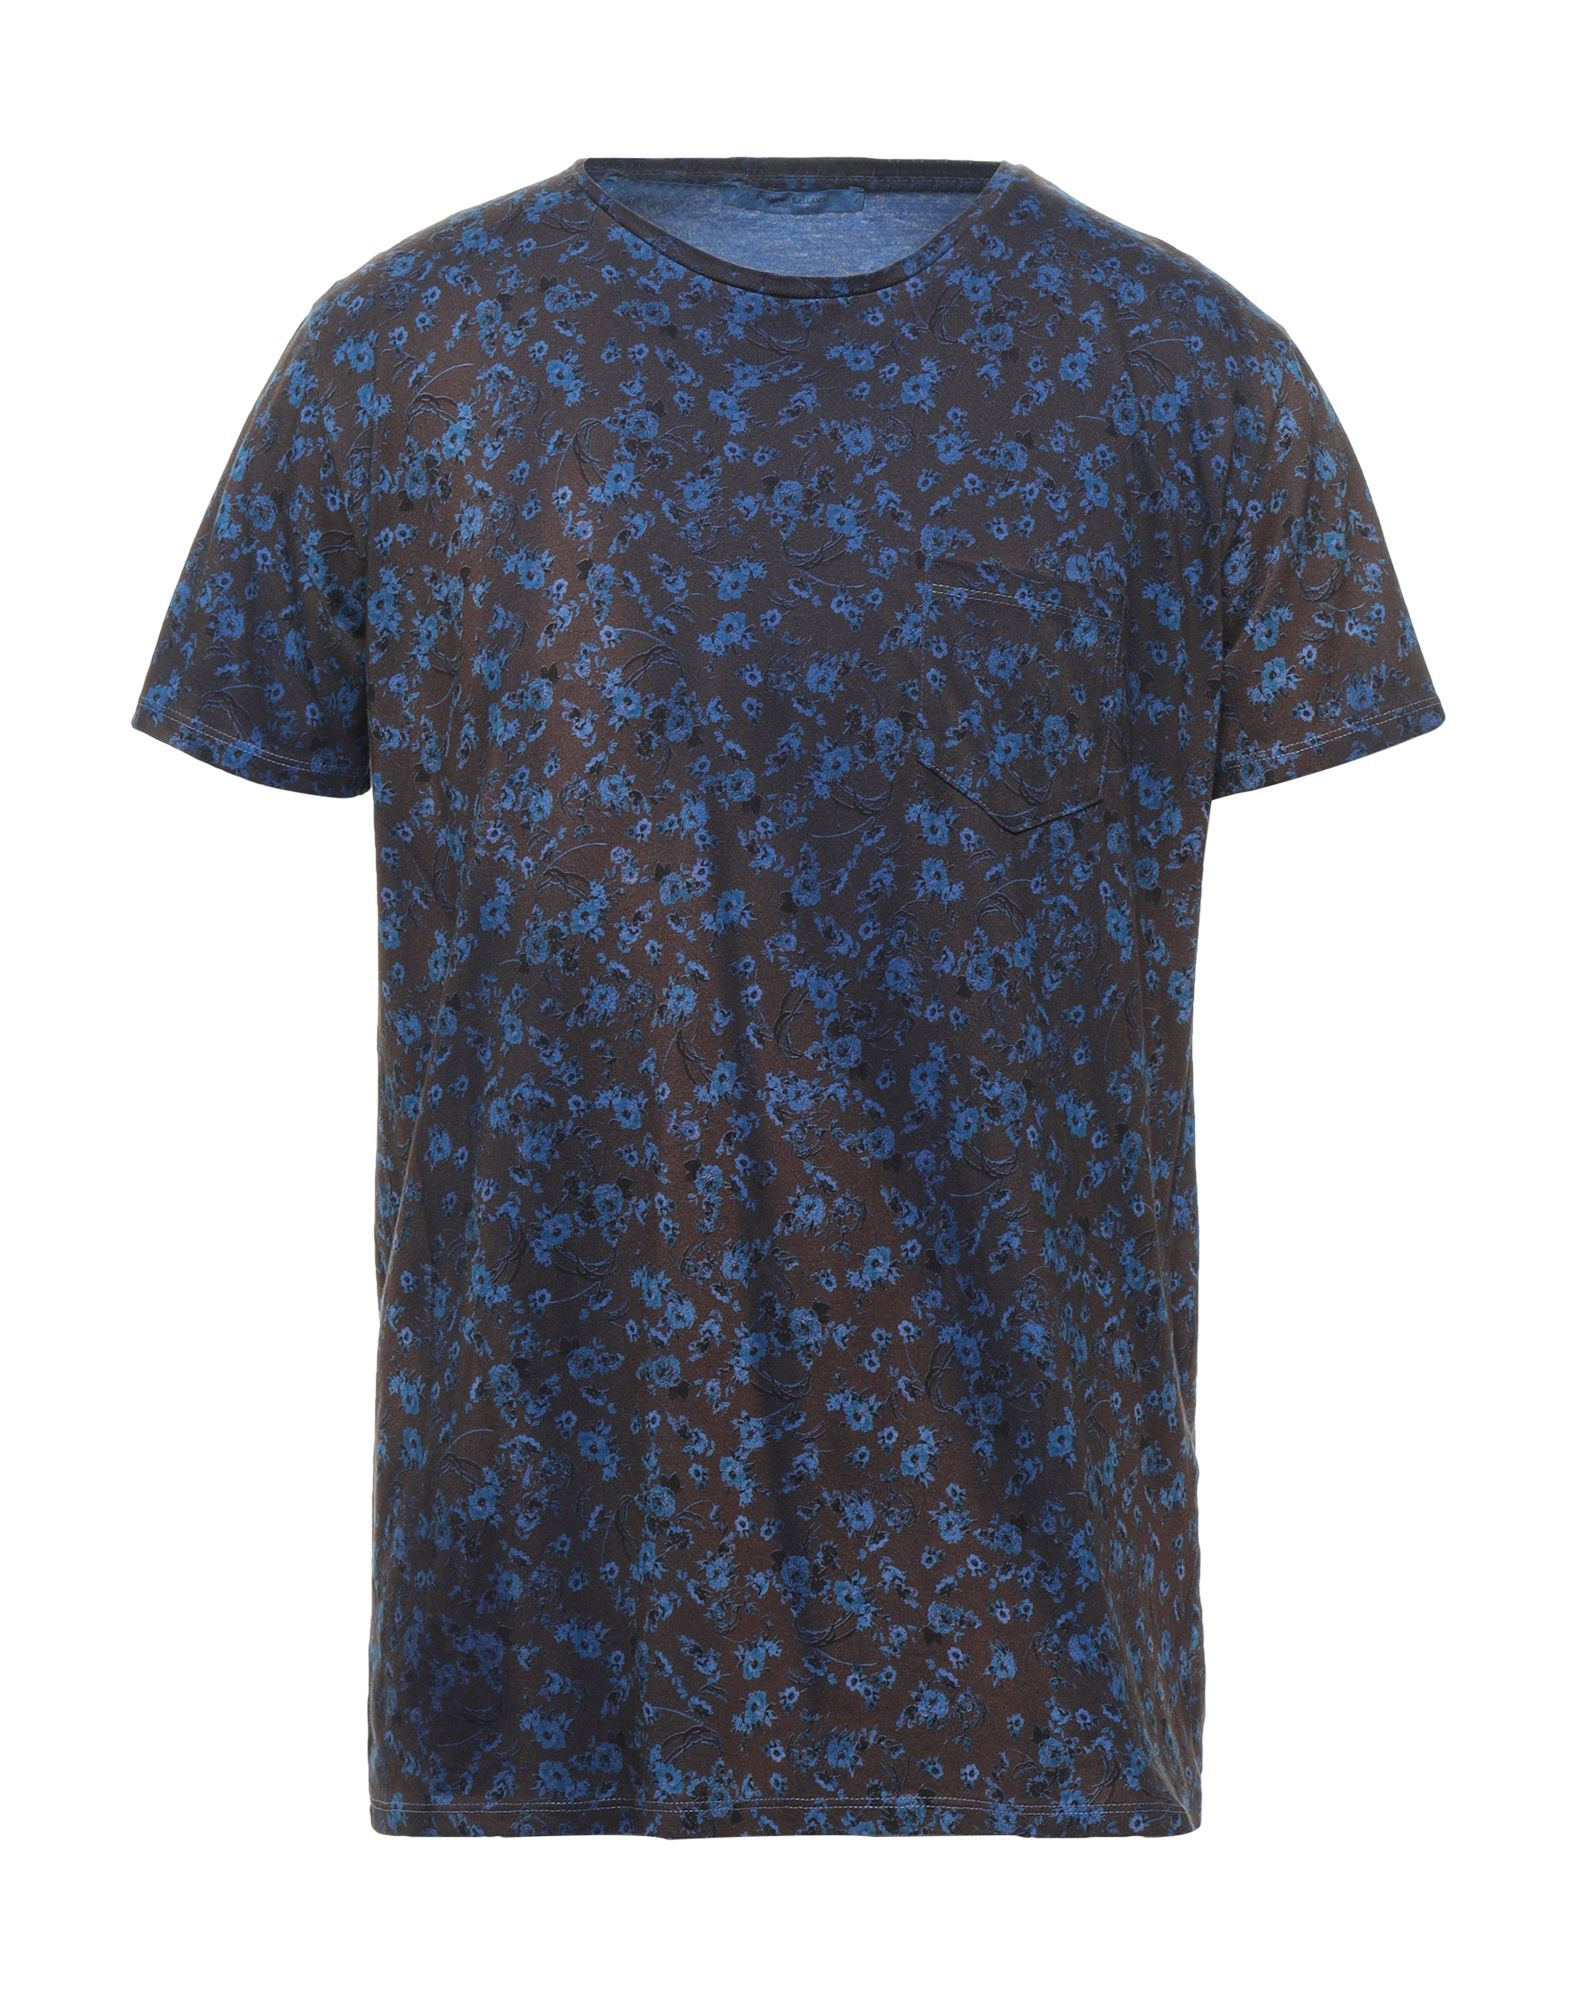 Ermanno Gallamini T-shirts In Brown